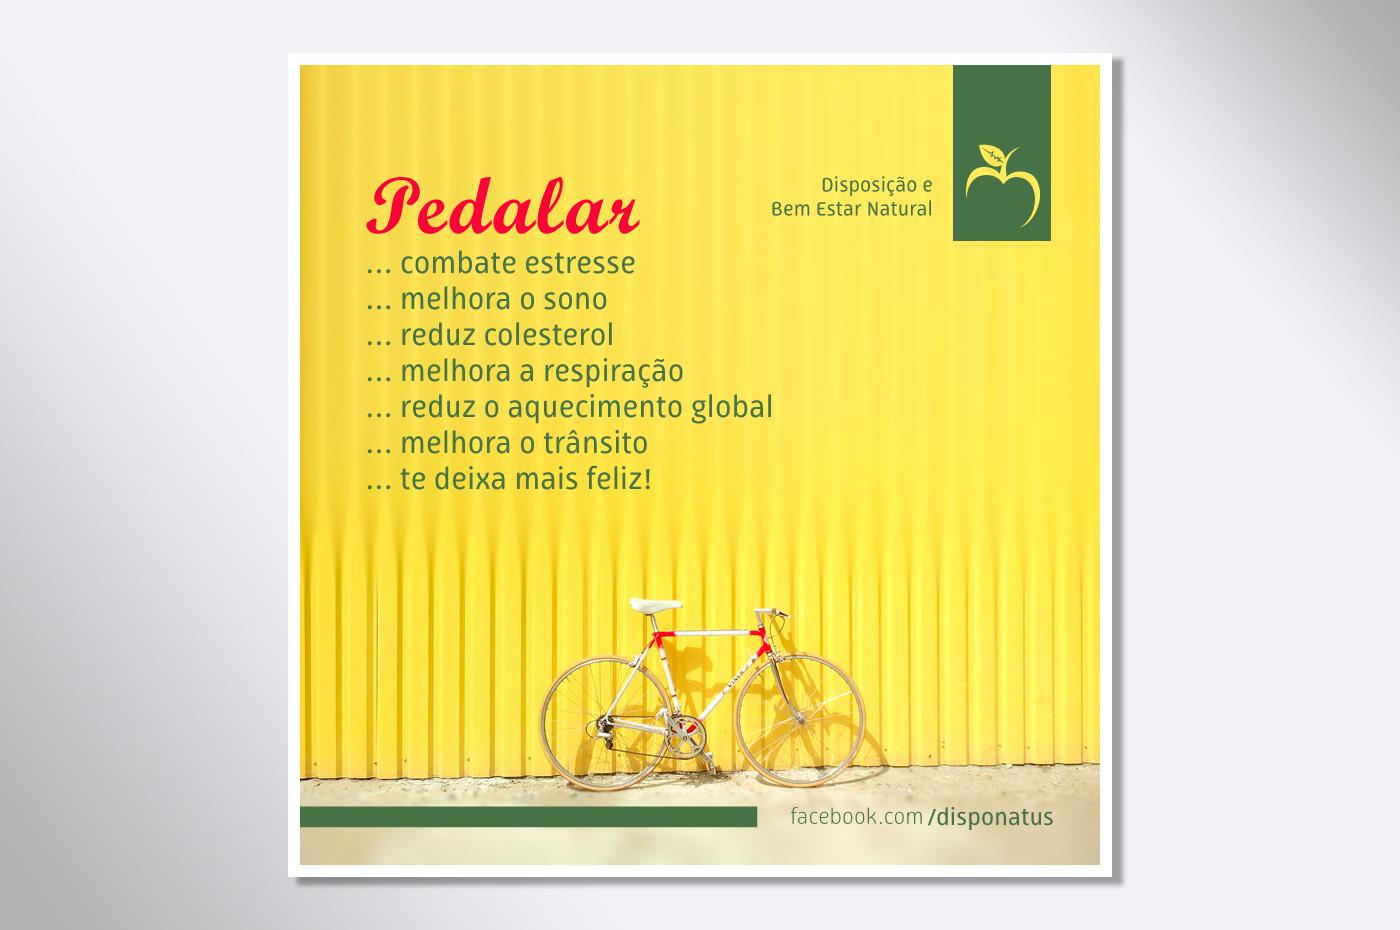 https://www.rafaeloliveira.com/portfolio/disponatus